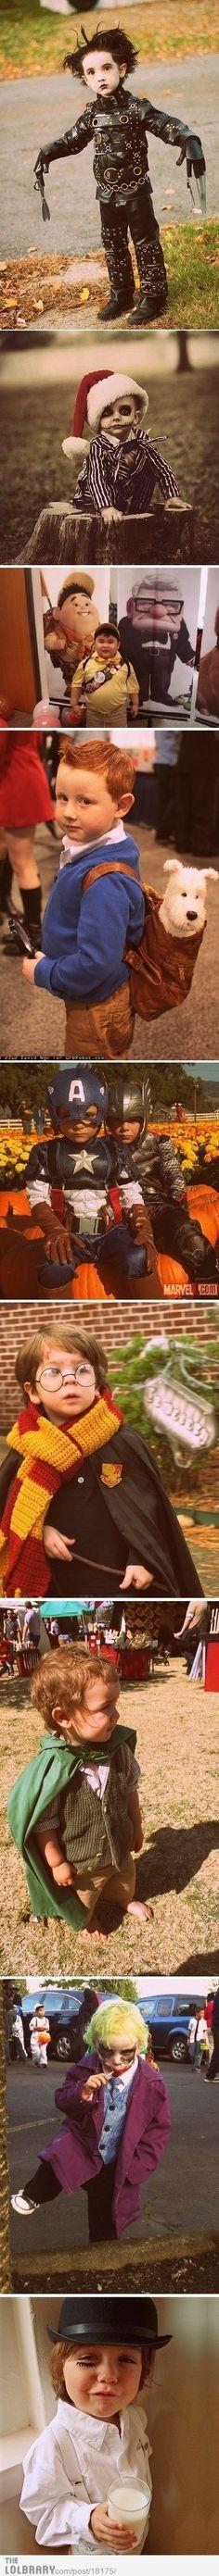 AMAZING kid costume ideas